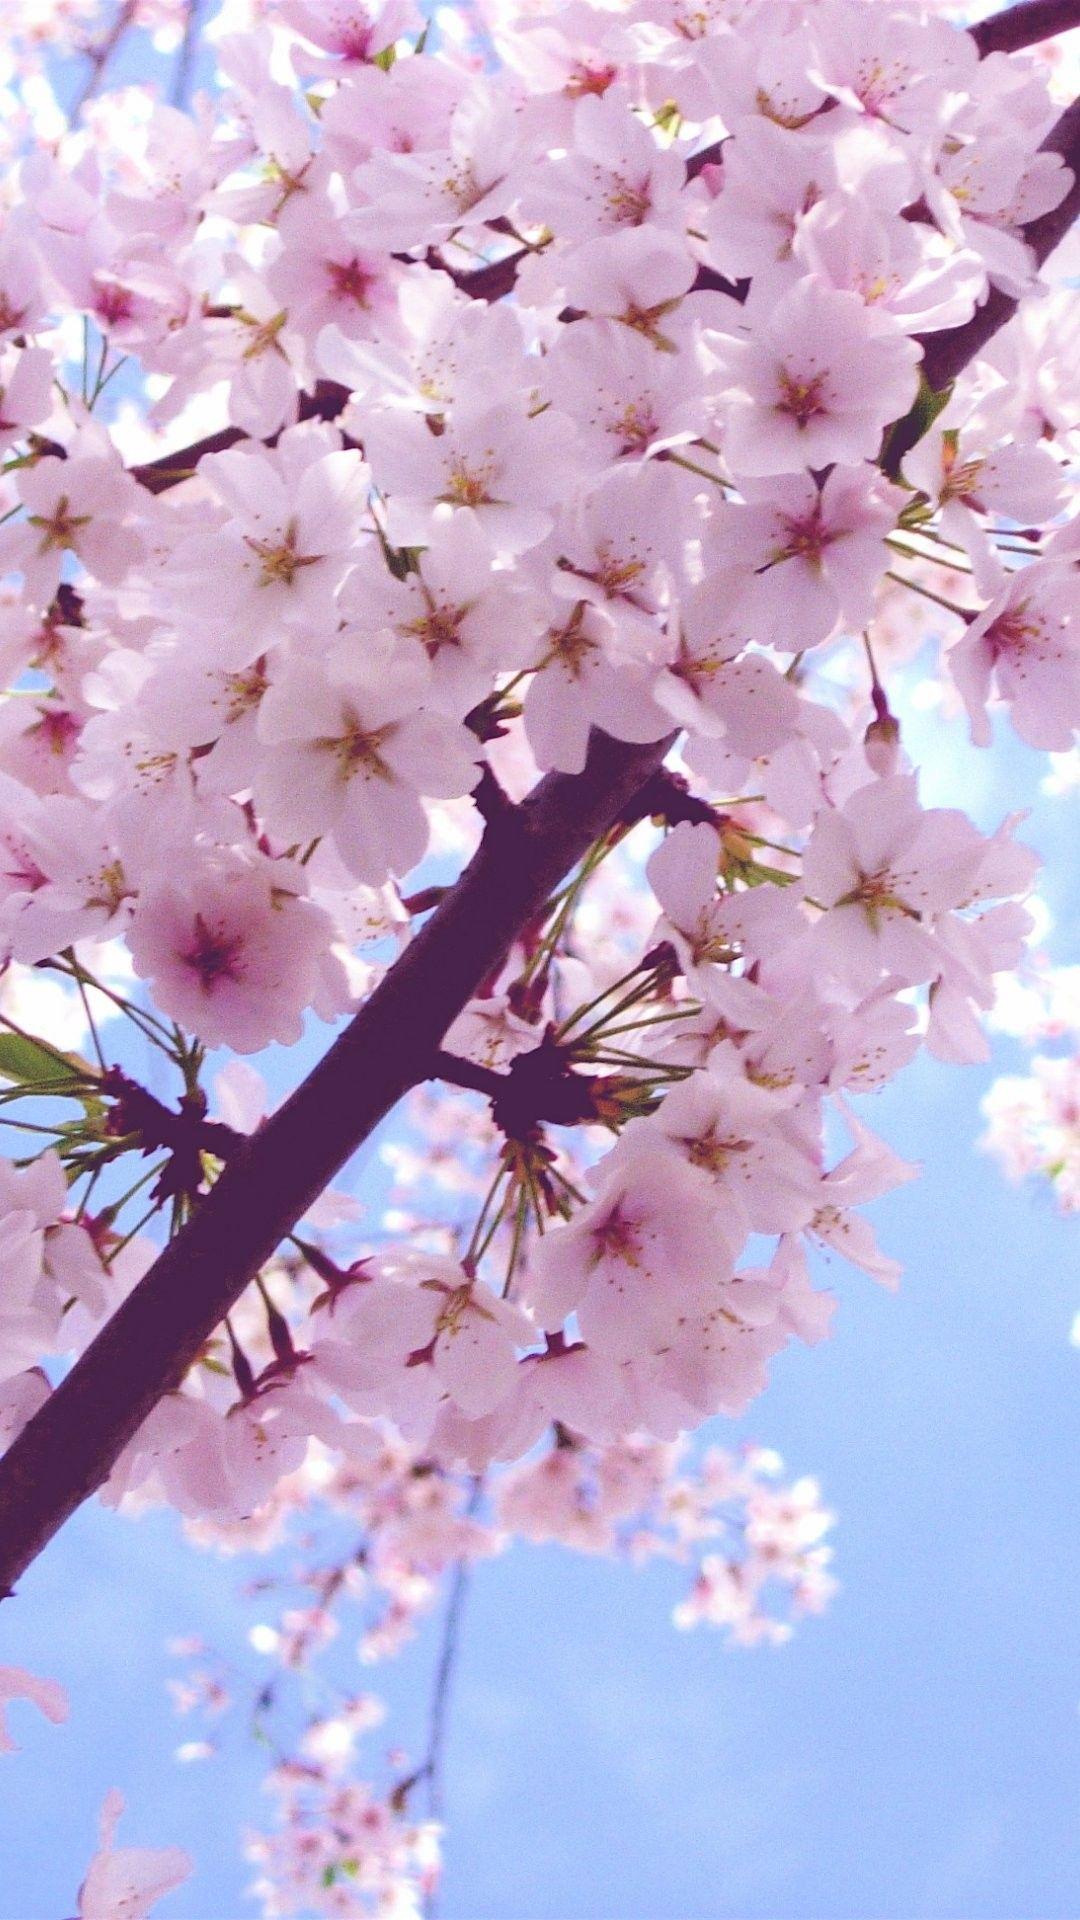 Spring Flowers Wallpaper High Resolution For Iphone Wallpaper On Hupages Com Flower Iphone Wallpaper Cherry Blossom Wallpaper Iphone Cherry Blossom Wallpaper